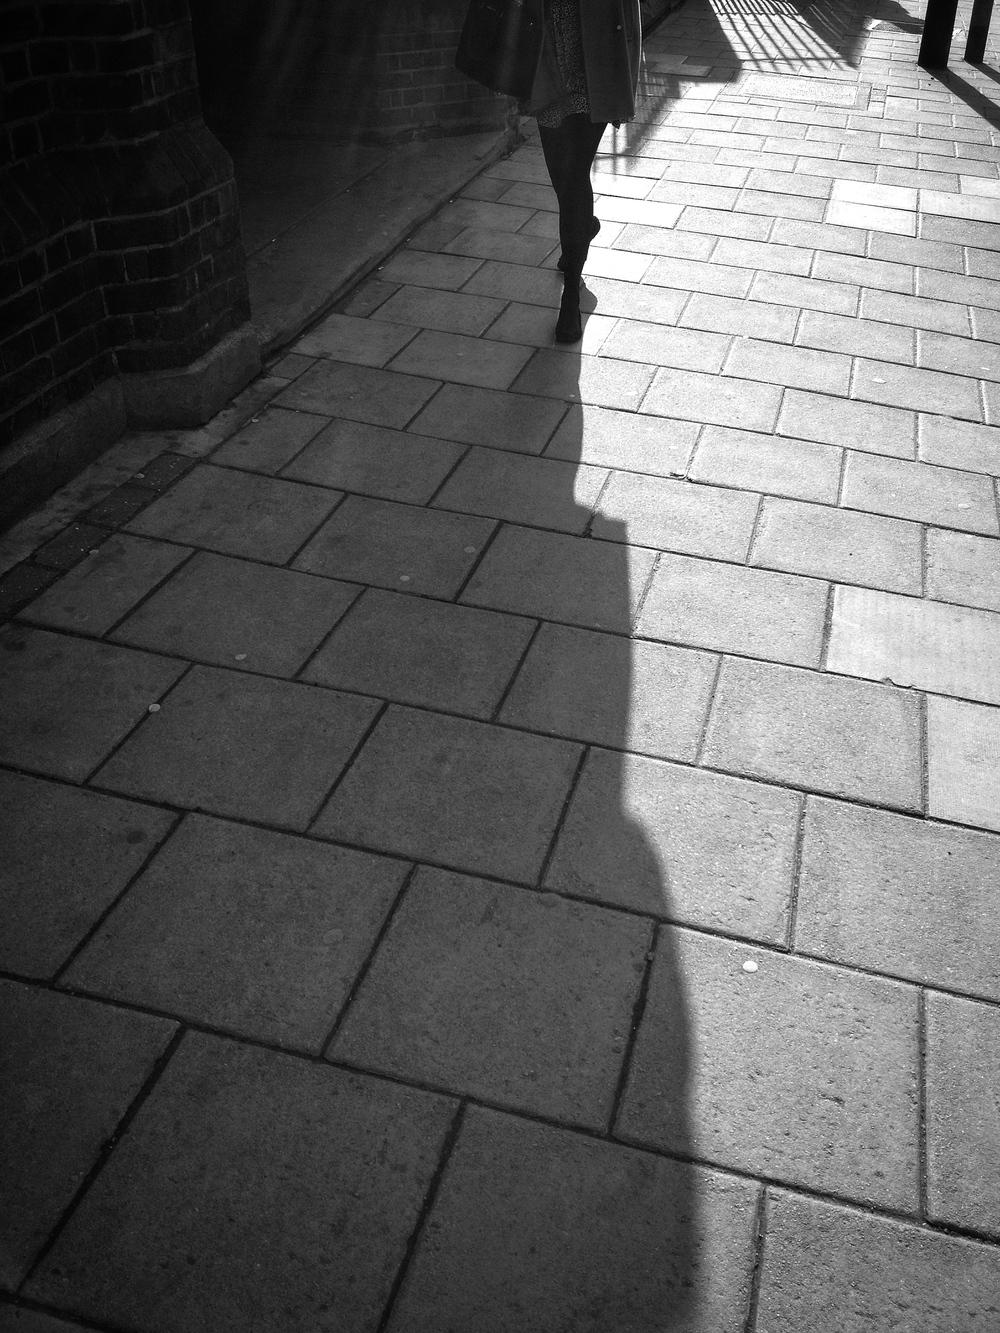 shadow-dancer-janbernet-photography.JPG